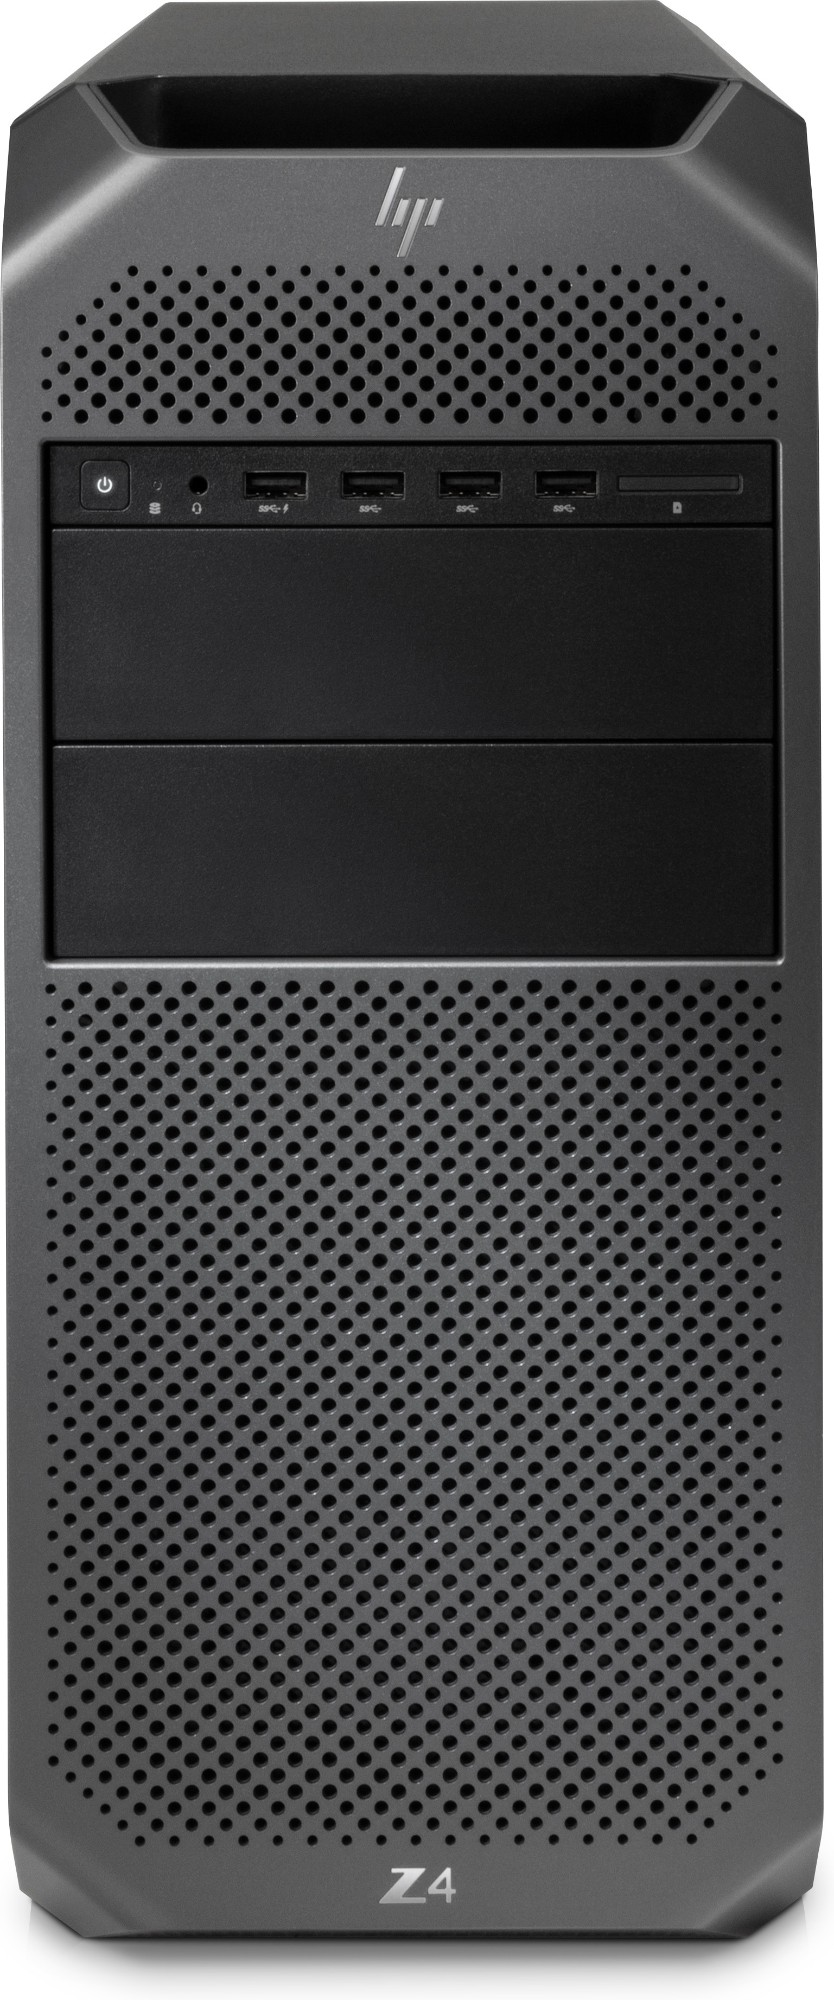 HP Z4 G4 Intel® Xeon® W W-2235 32 GB DDR4-SDRAM 512 GB SSD Tower Negro Puesto de trabajo Windows 10 Pro